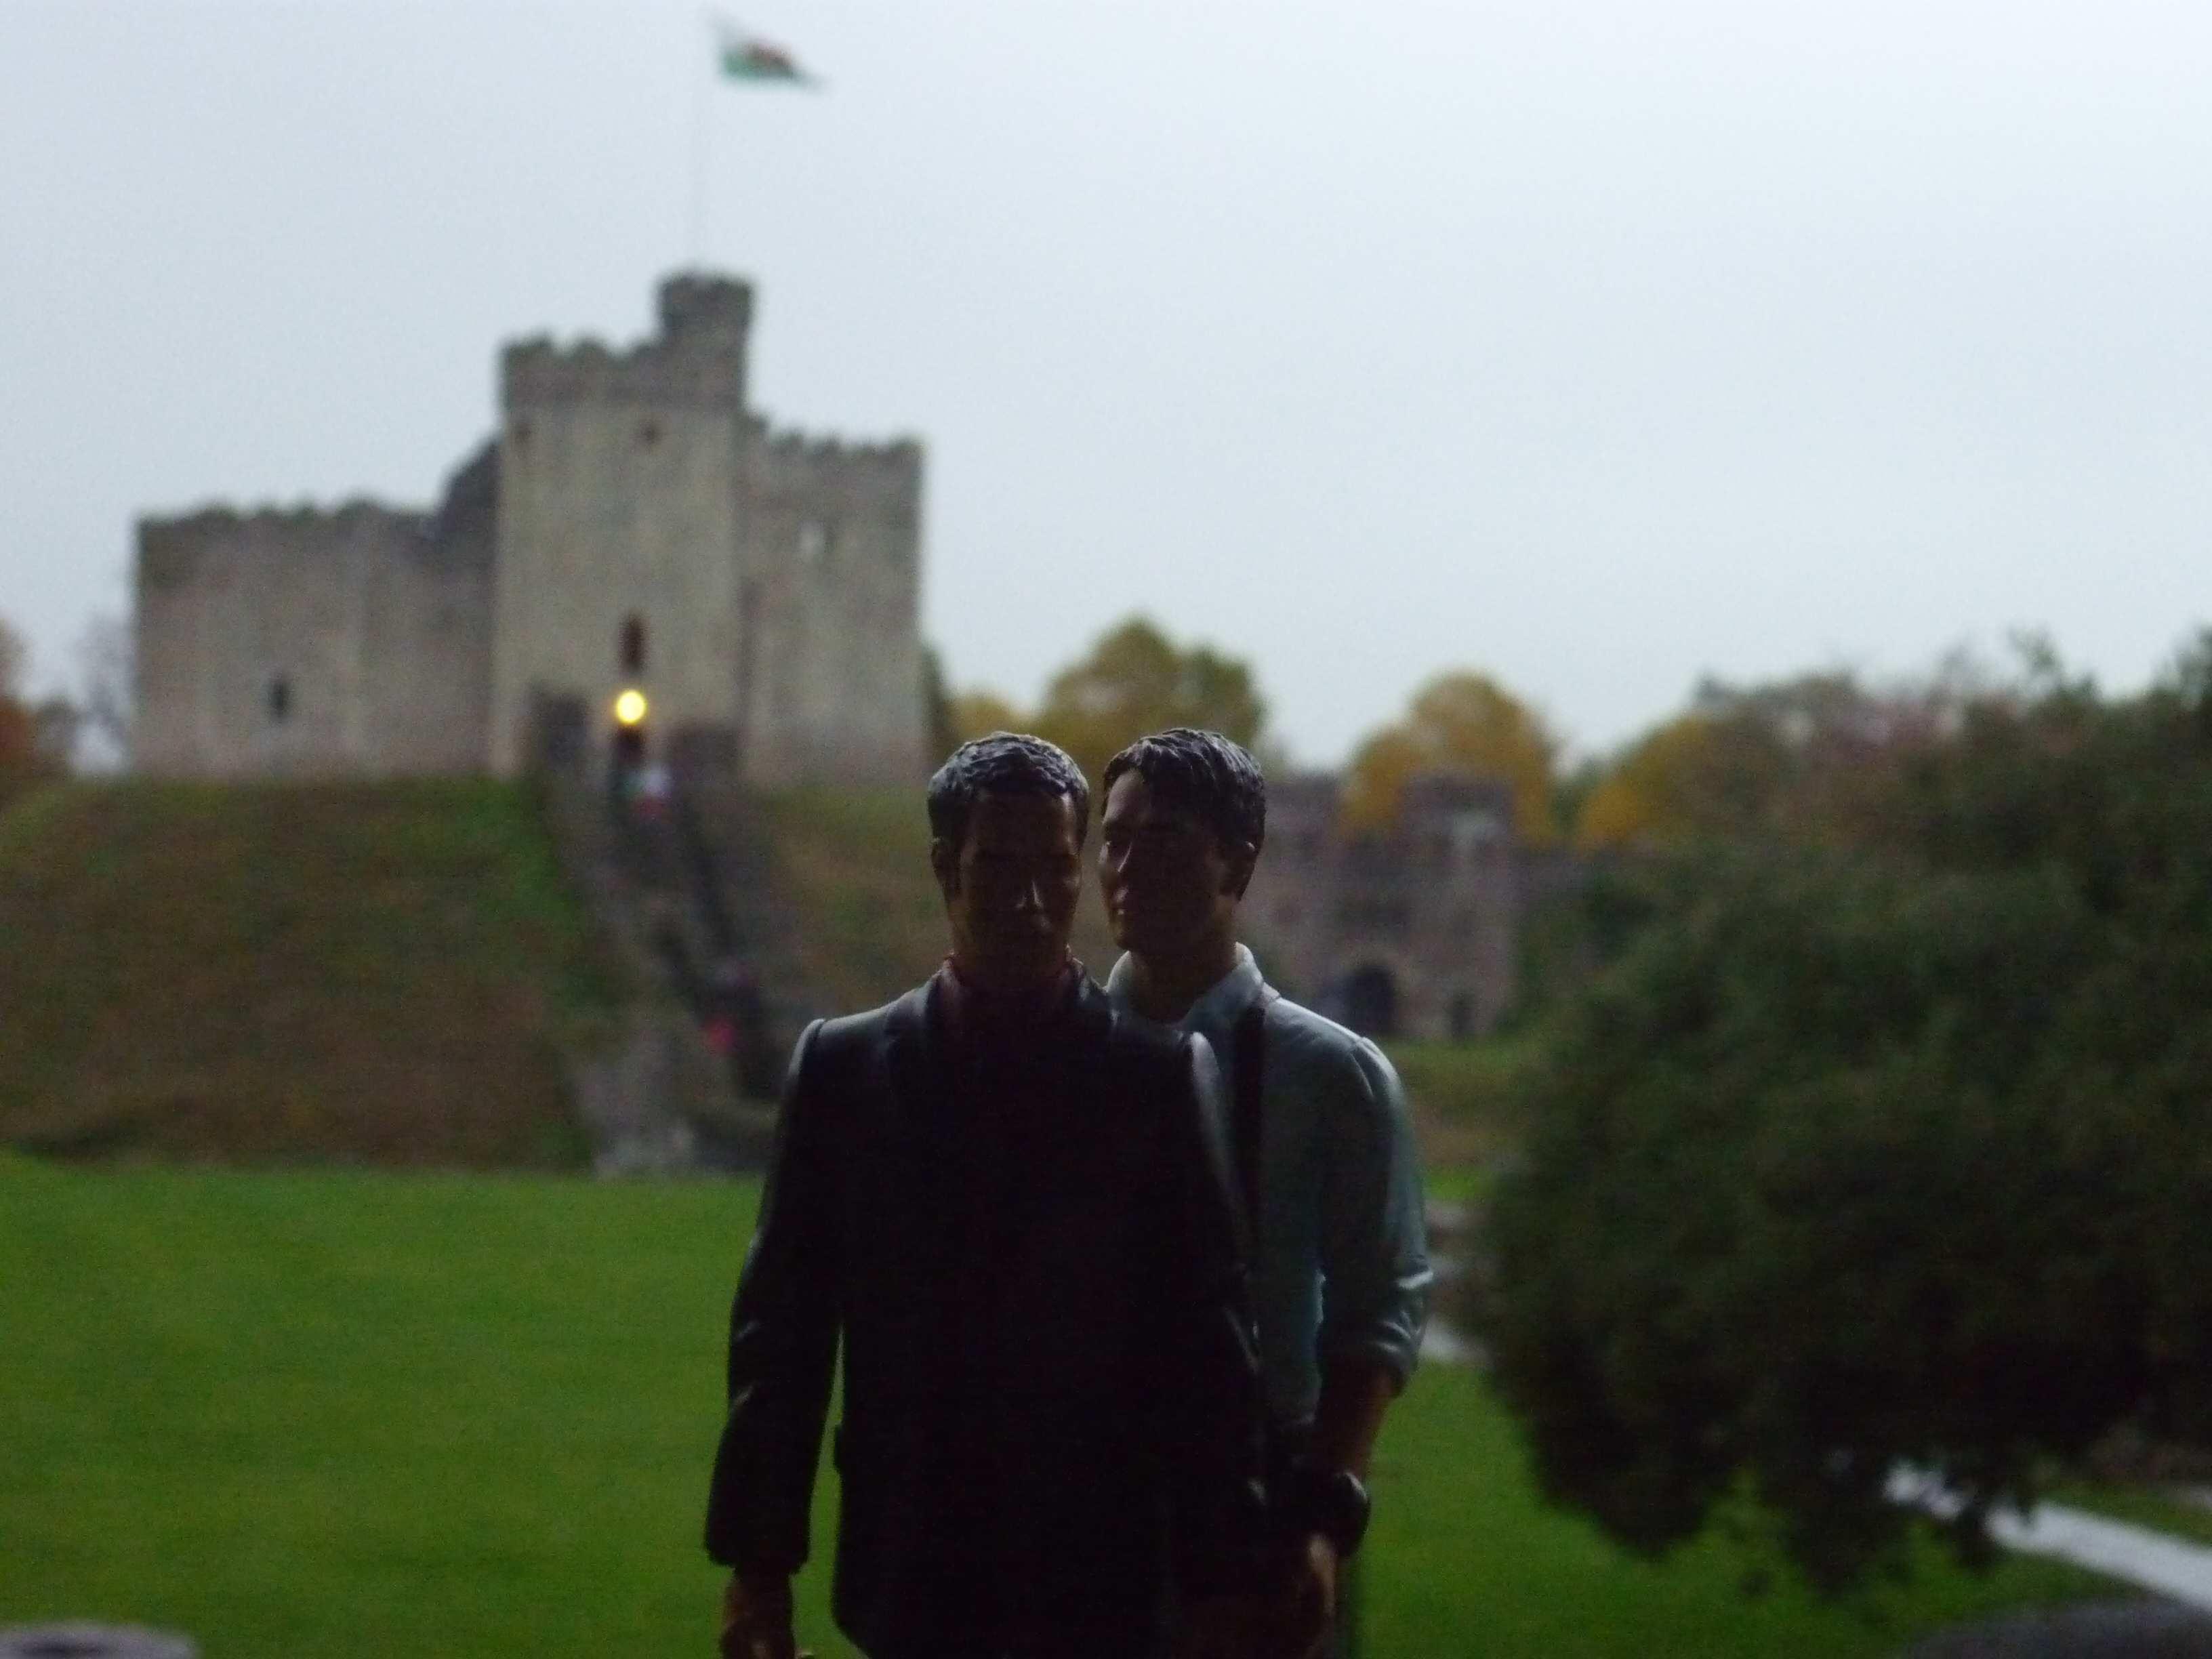 2012.11.01 -01- Cardiff Castle